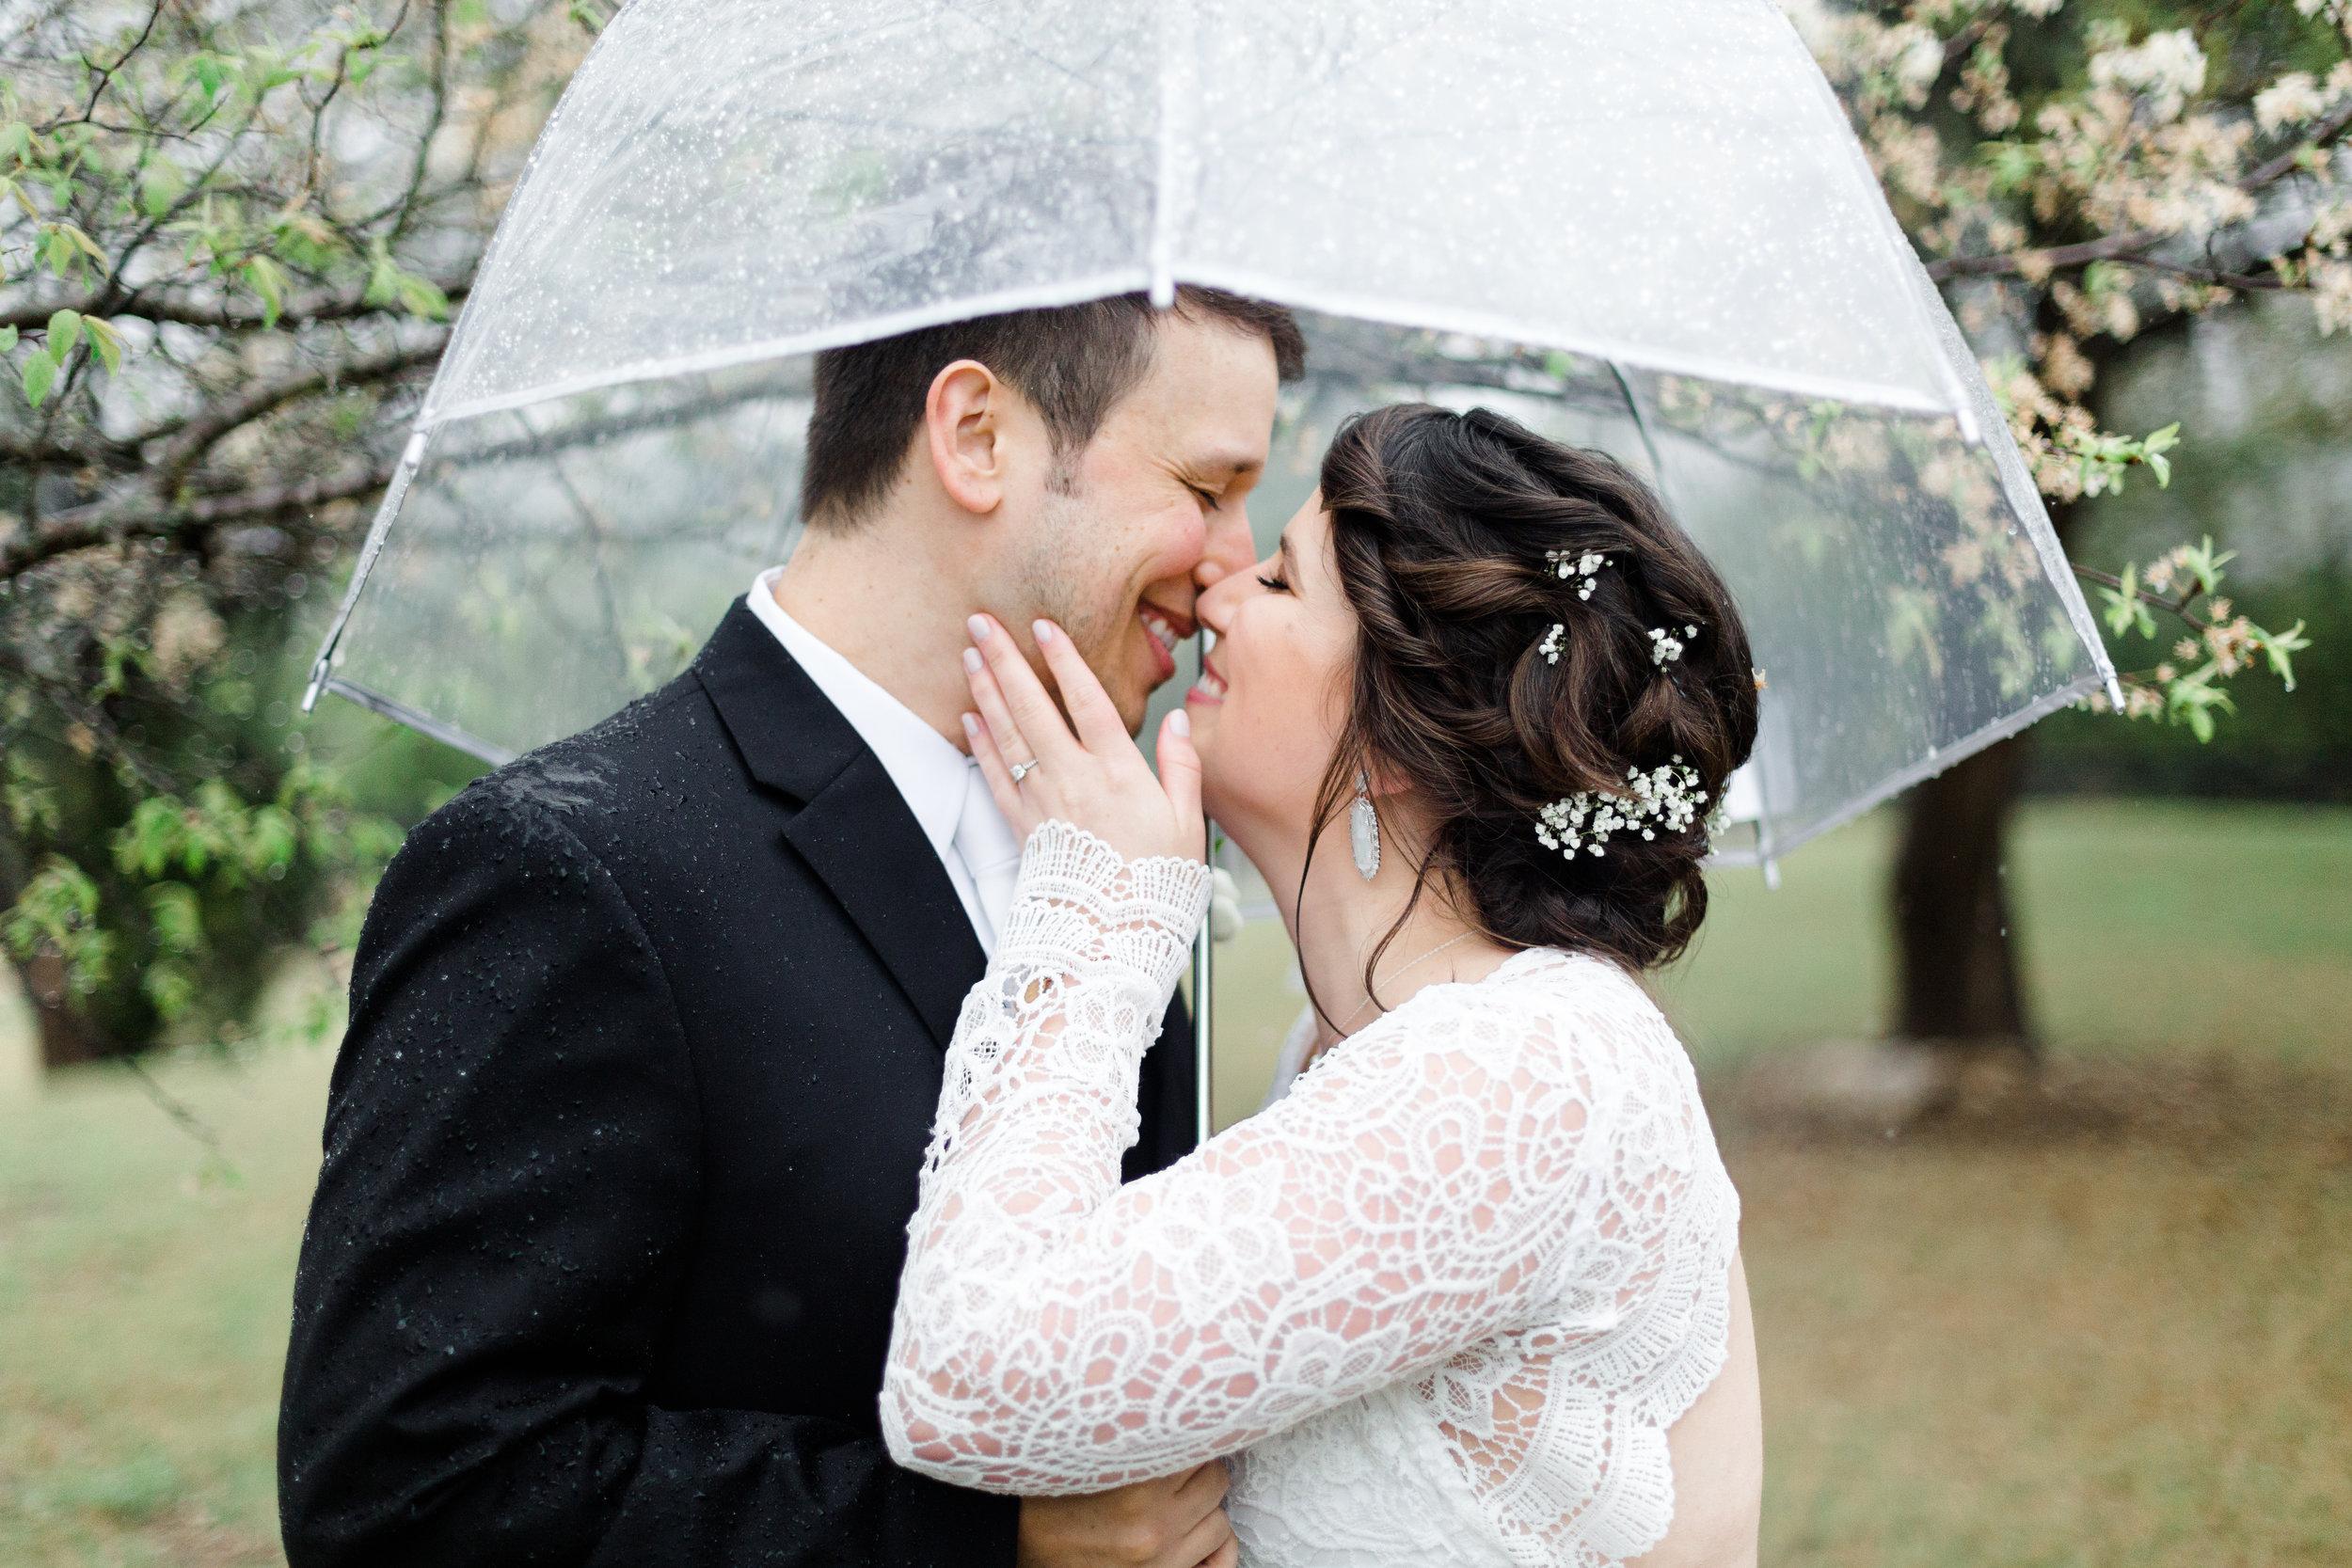 Austin_Texas_Fine_Art_Wedding_Photographer_Kayla_Snell_Photography_Antebellum_Oaks249.jpg